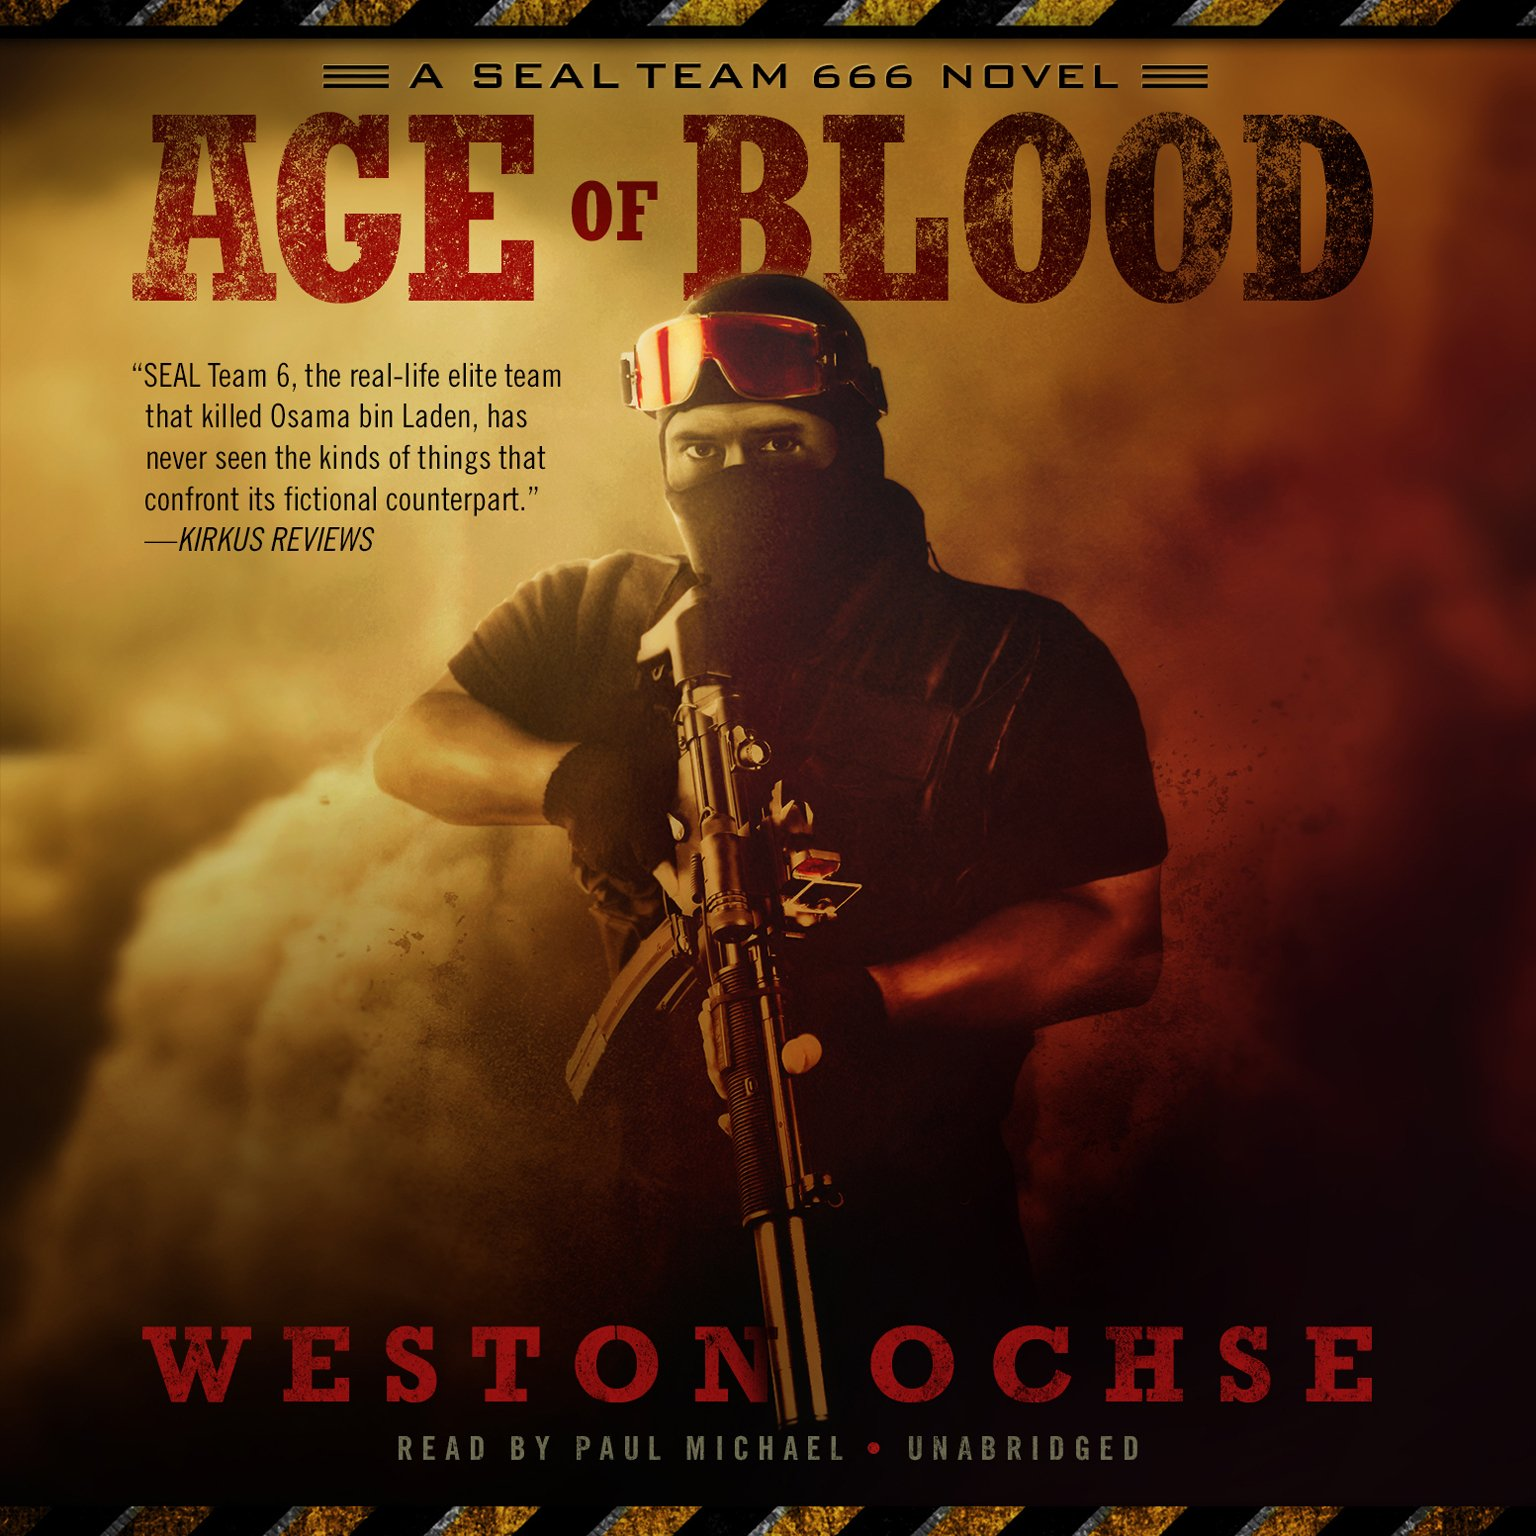 Amazon.com: Age of Blood (SEAL Team 666 series, Book 2) (9781482989205):  Weston Ochse: Books